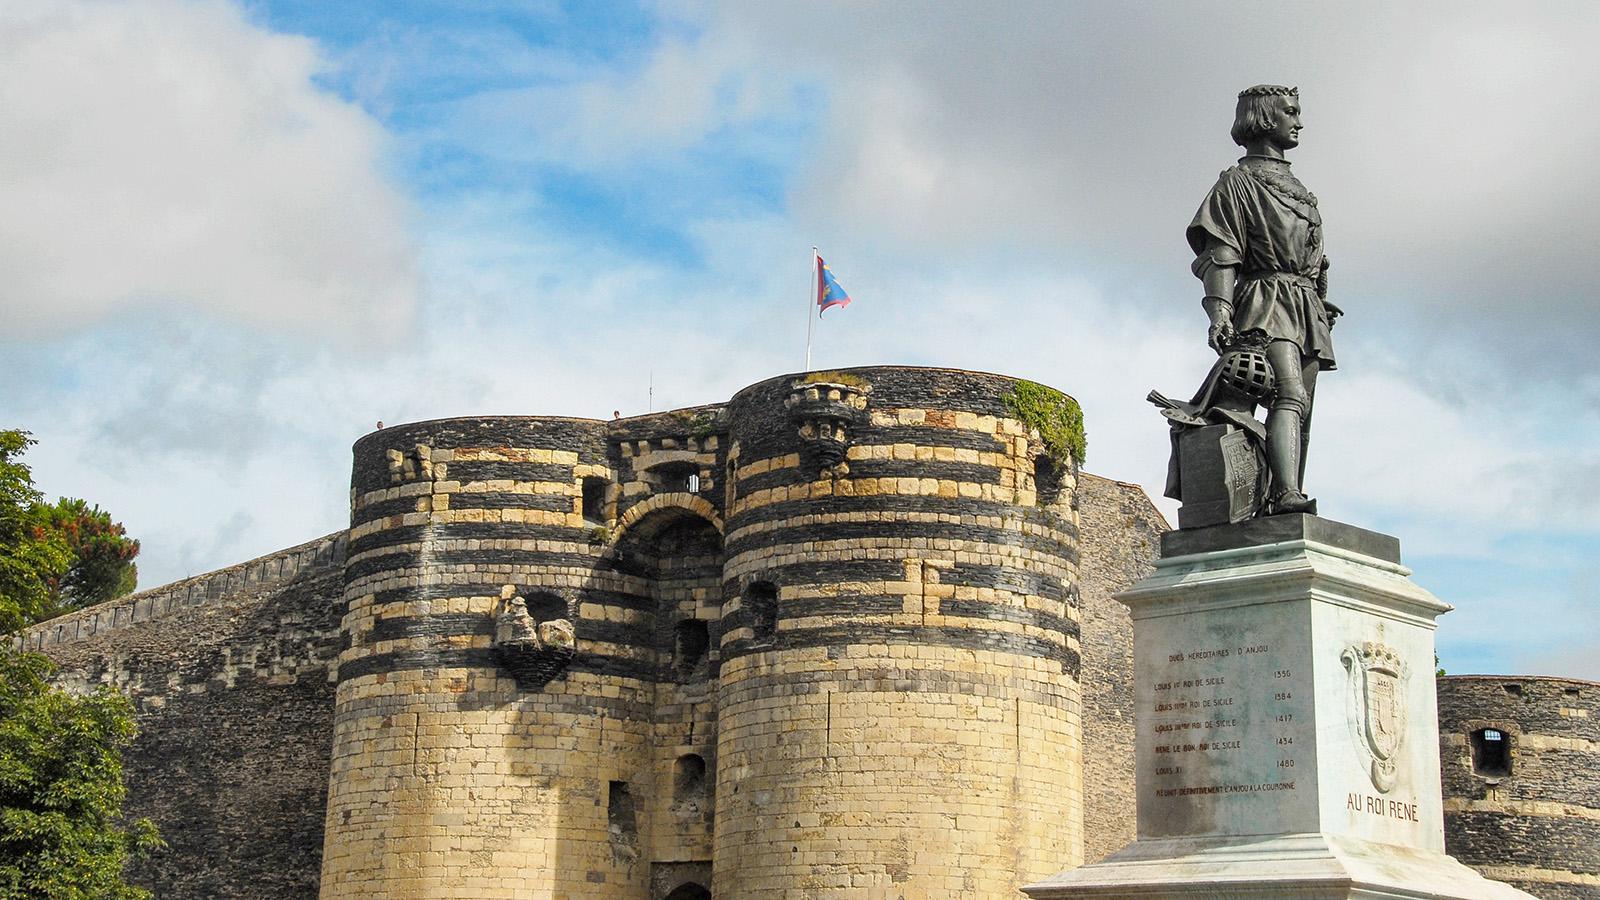 Der gute König René vor seinem Schloss in Angers. Foto: Hilke Maunder